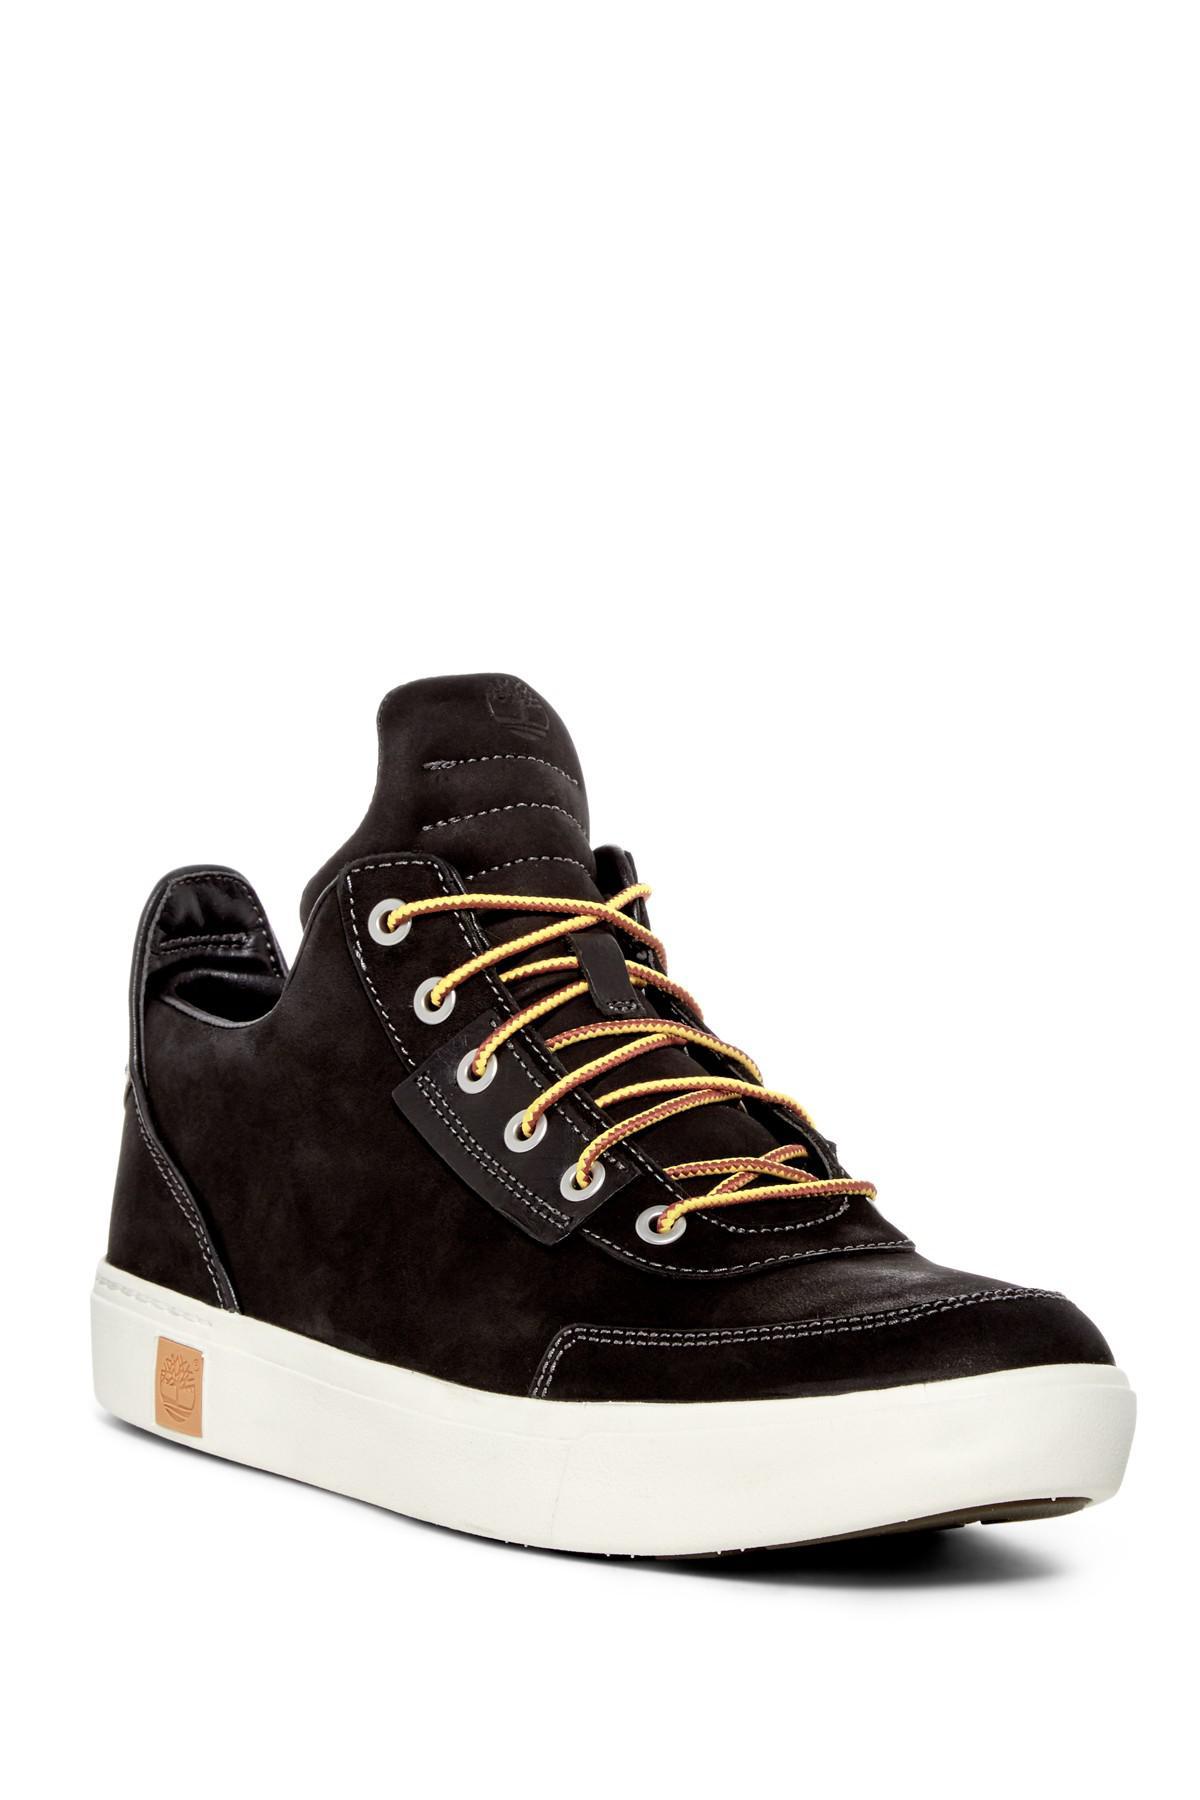 Timberland Amherst Nubuck High Top Chukka Sneaker ktHfwWJ